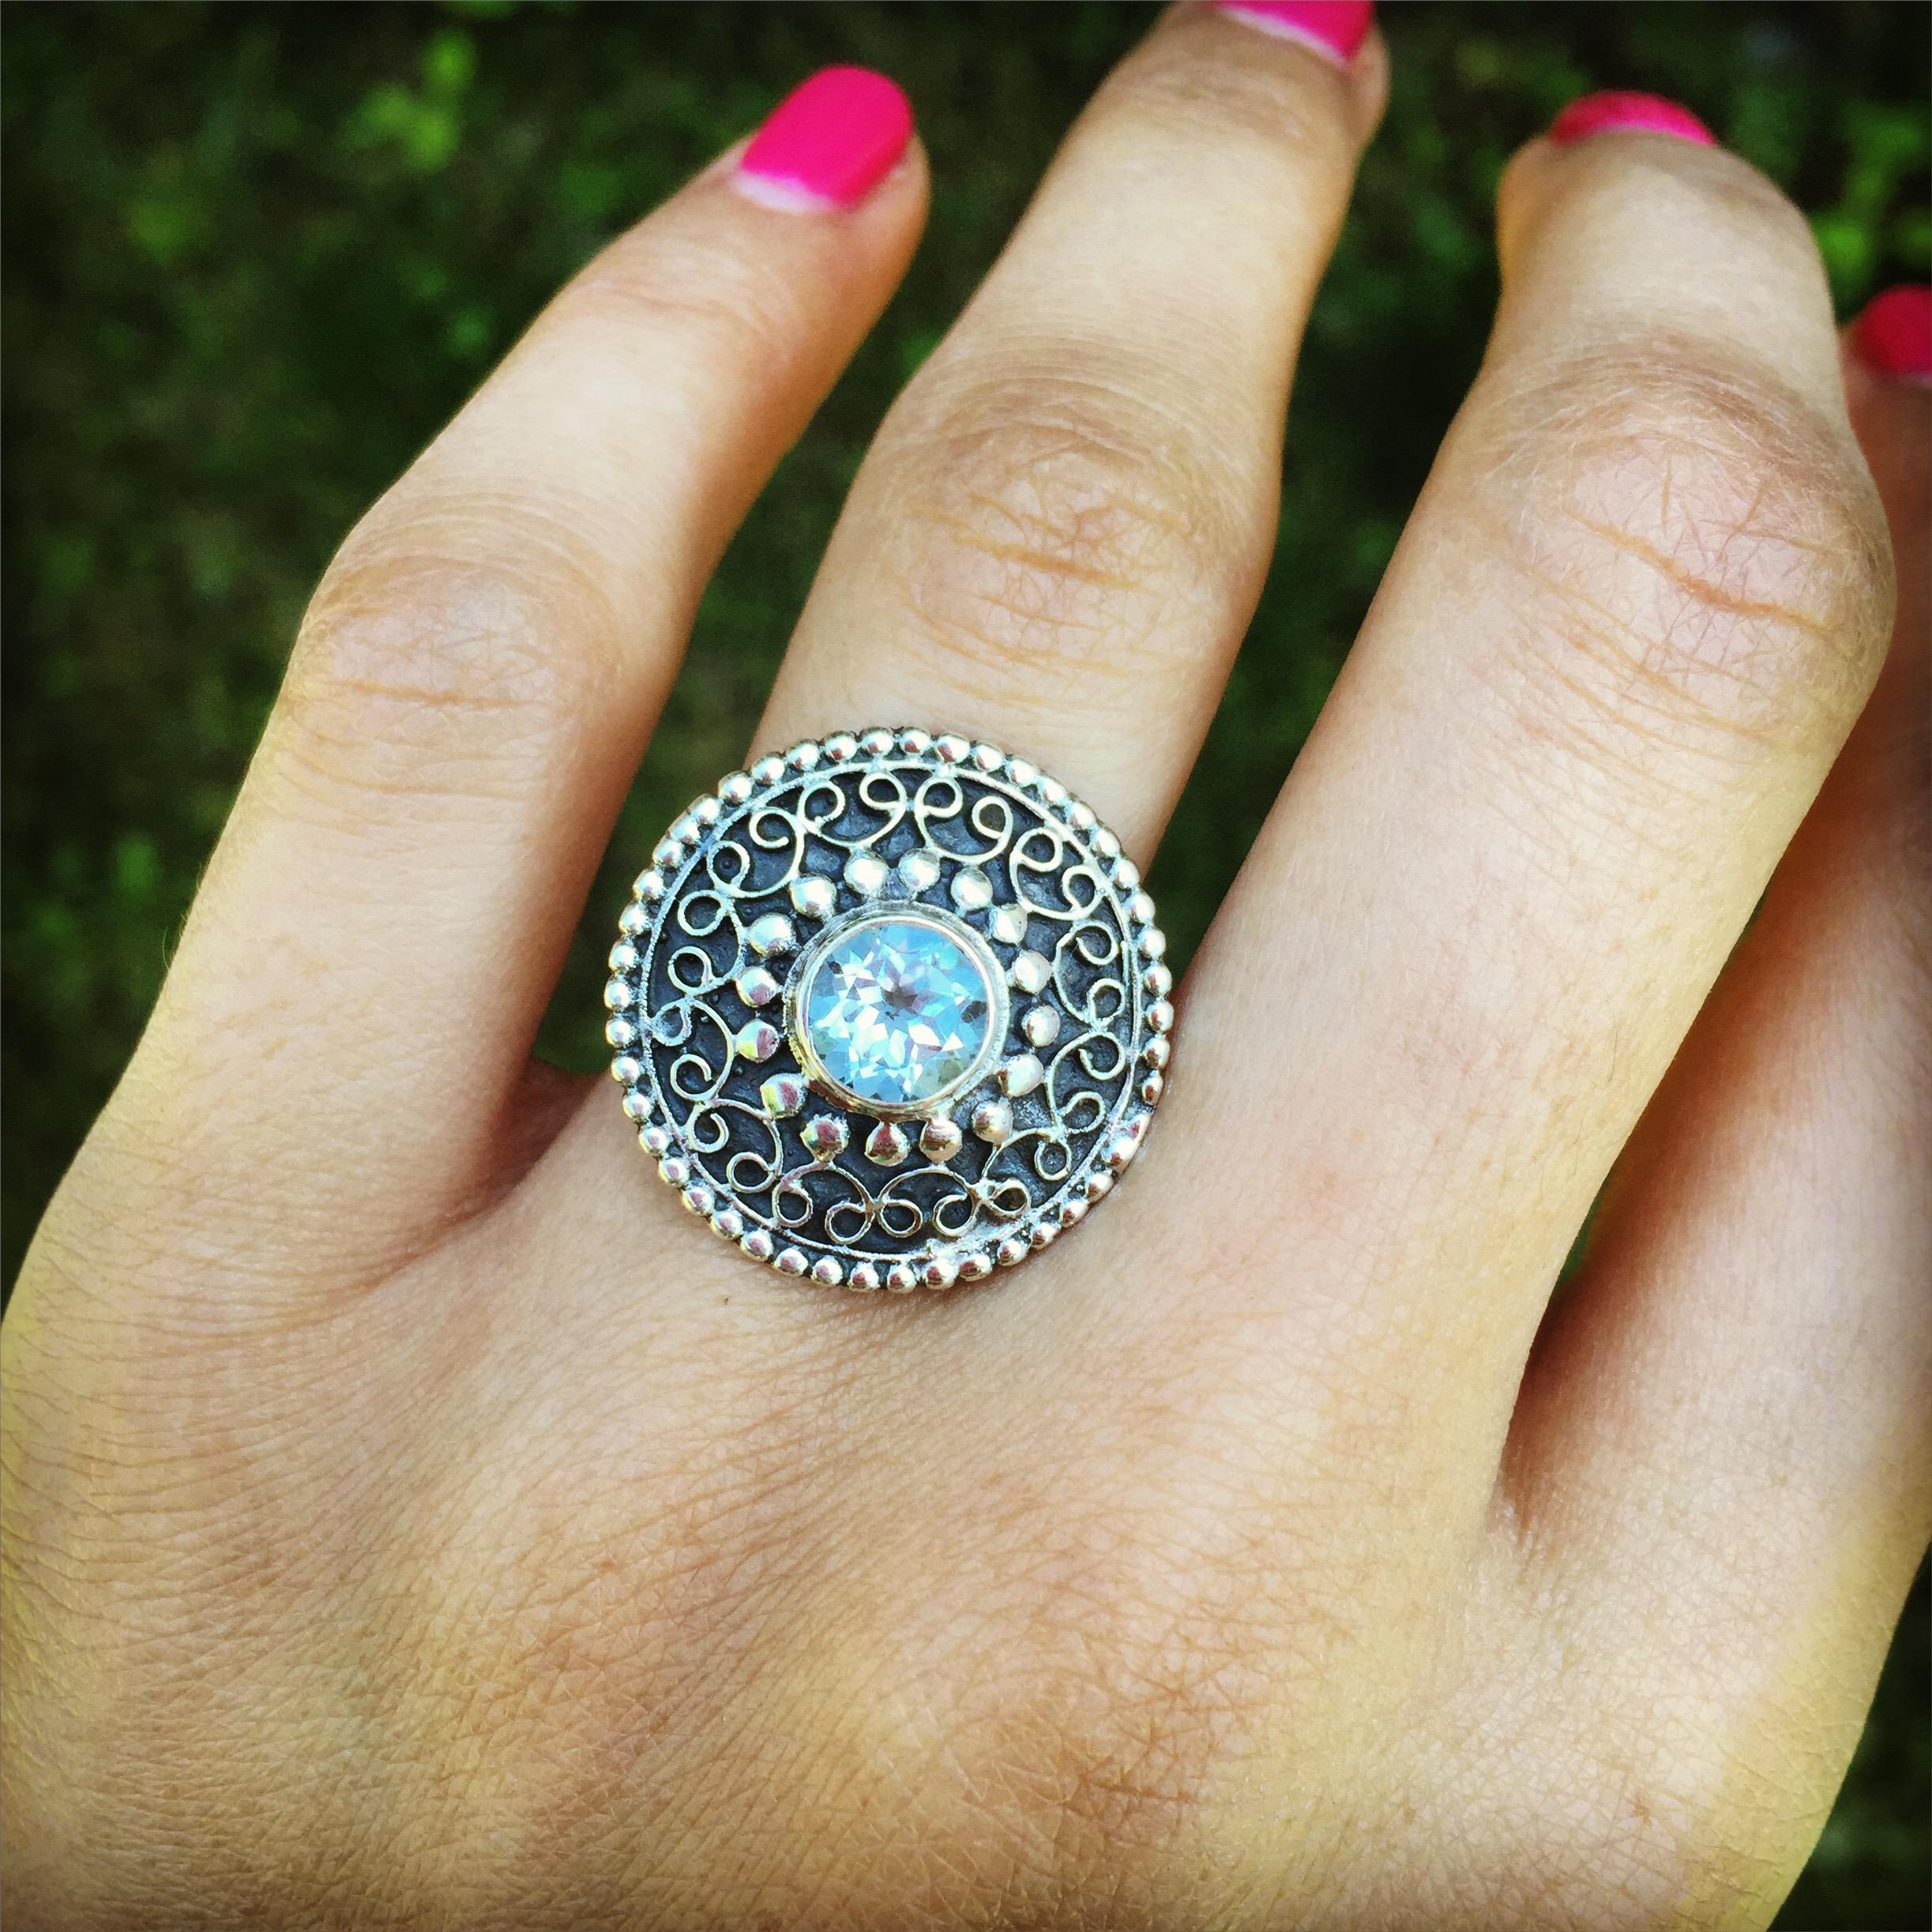 blue topaz 925 Sterling Silver Ring